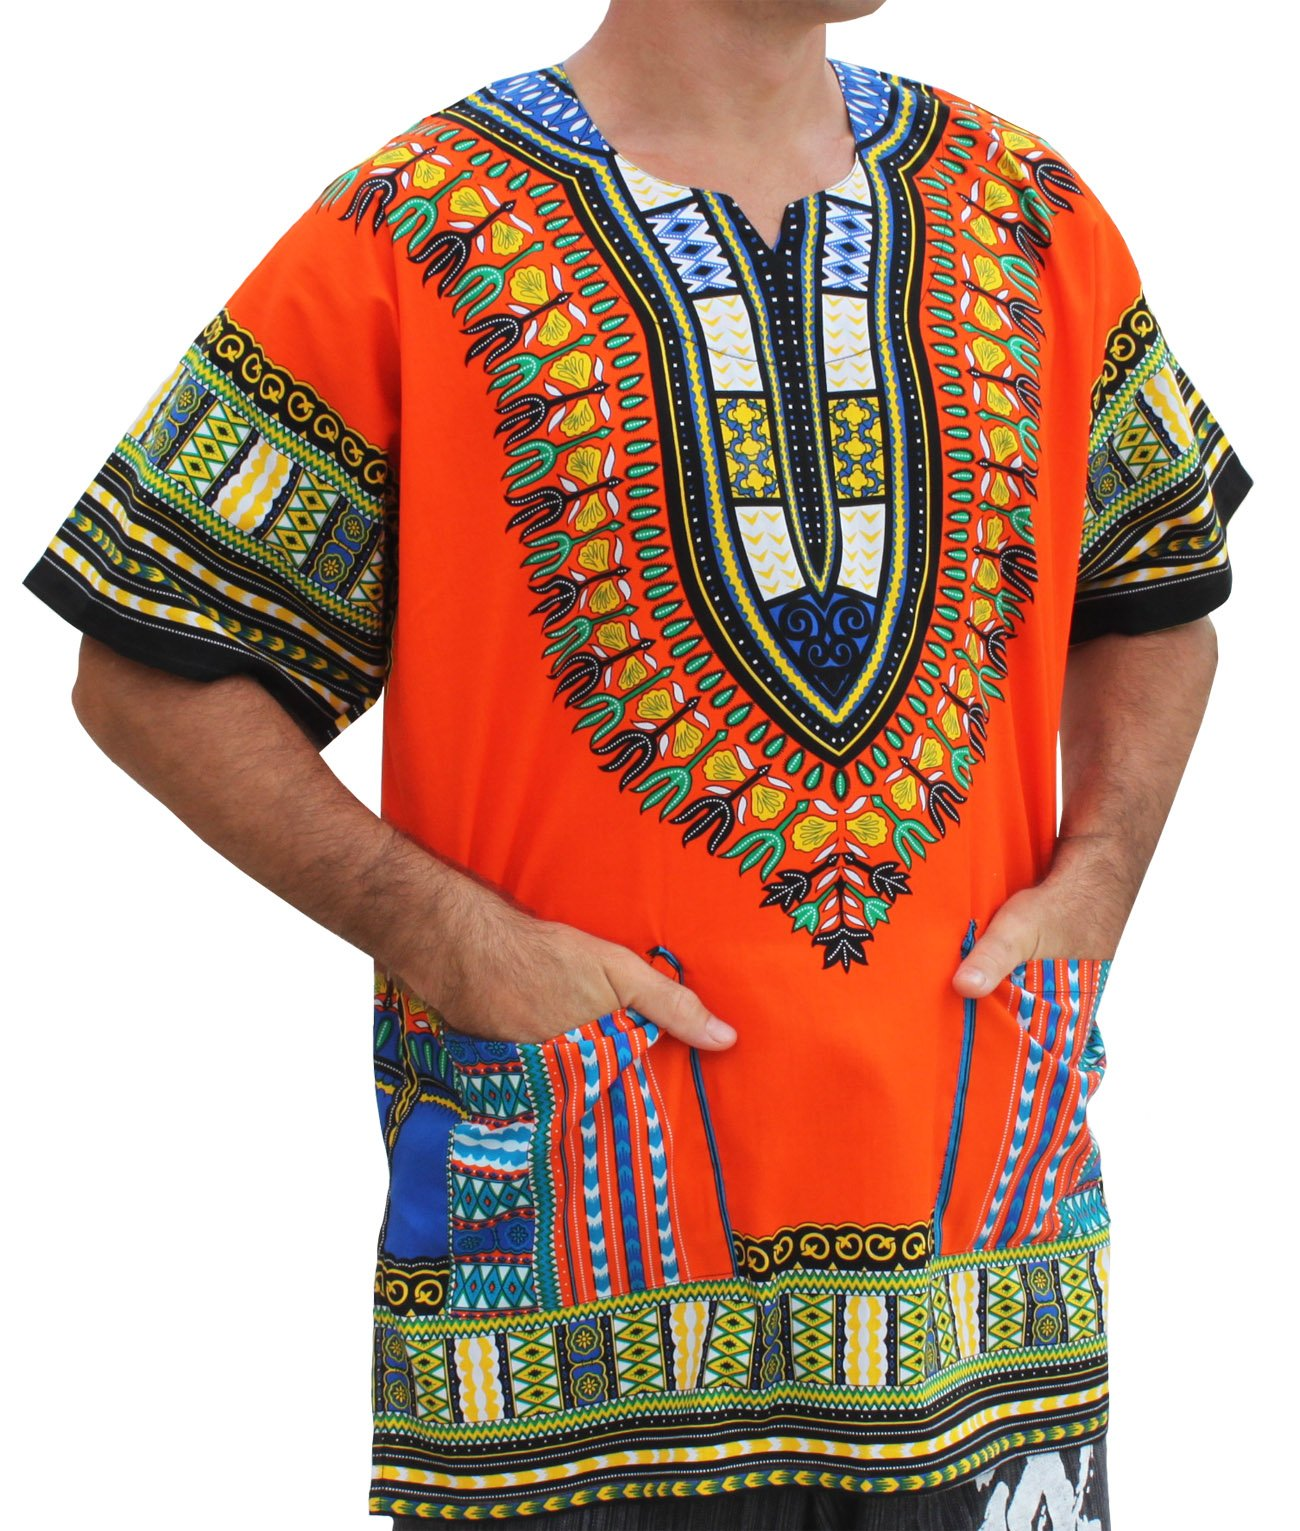 Raan Pah Muang RaanPahMuang Unisex Bright coloured African Dashiki Cotton Plus Shirt, XXXXXXX-Large, Orange